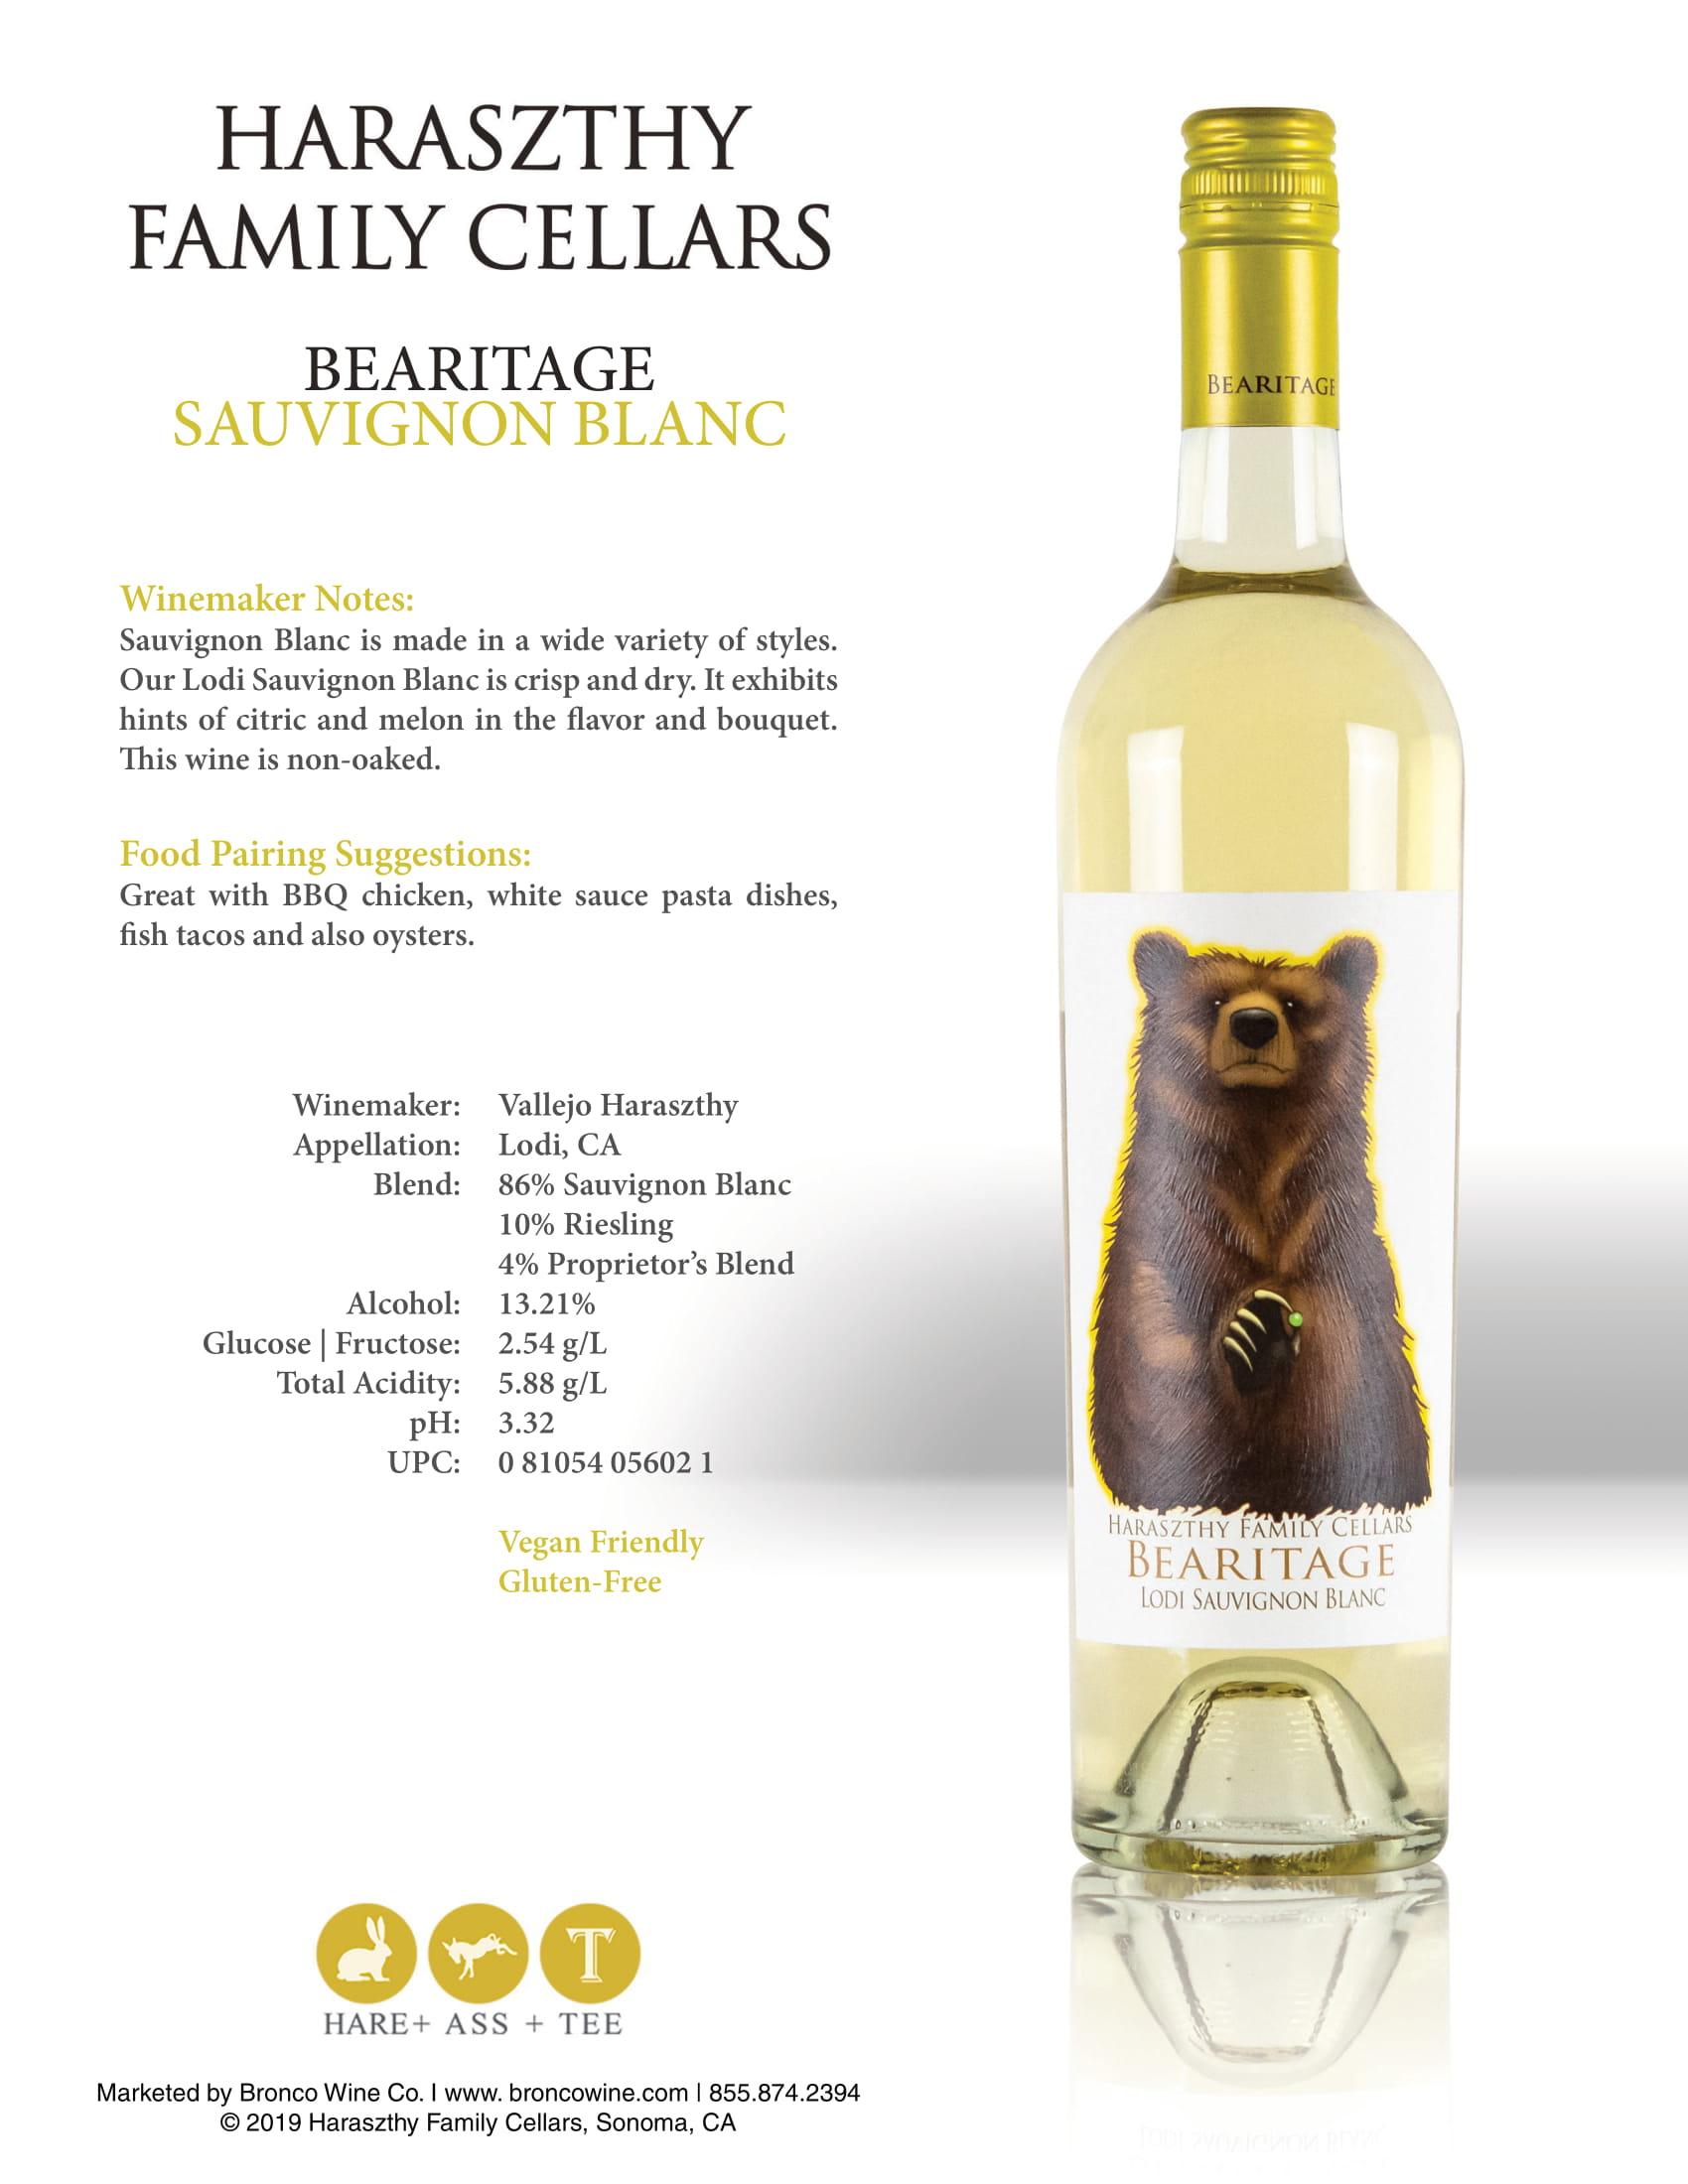 Haraszthy Bearitage Sauvignon Blanc Tech Sheet